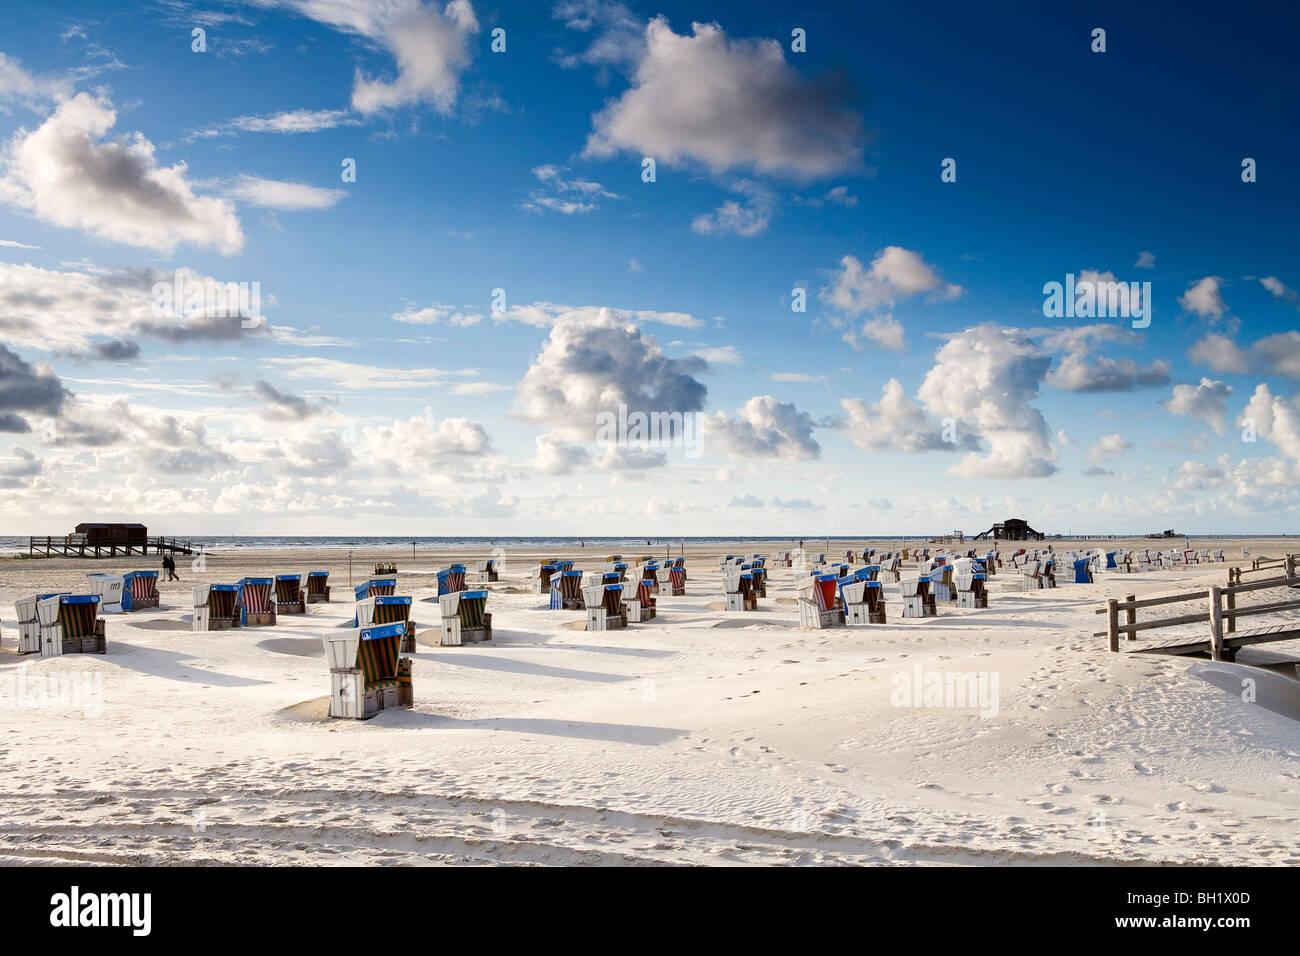 Sedie a sdraio sulla spiaggia, San Pietro Ording, penisola di Eiderstedt, Schleswig Holstein, Germania, Europa Immagini Stock